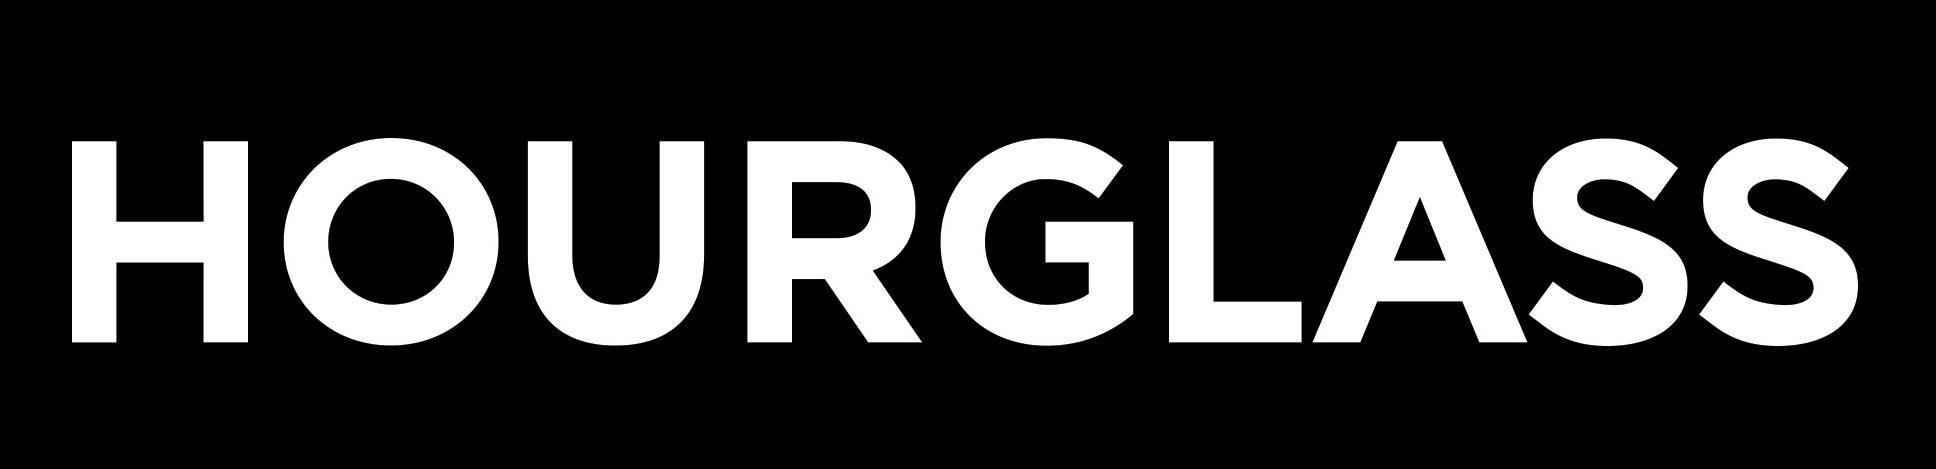 2Hourglass-Logo-white-FB-2.jpg